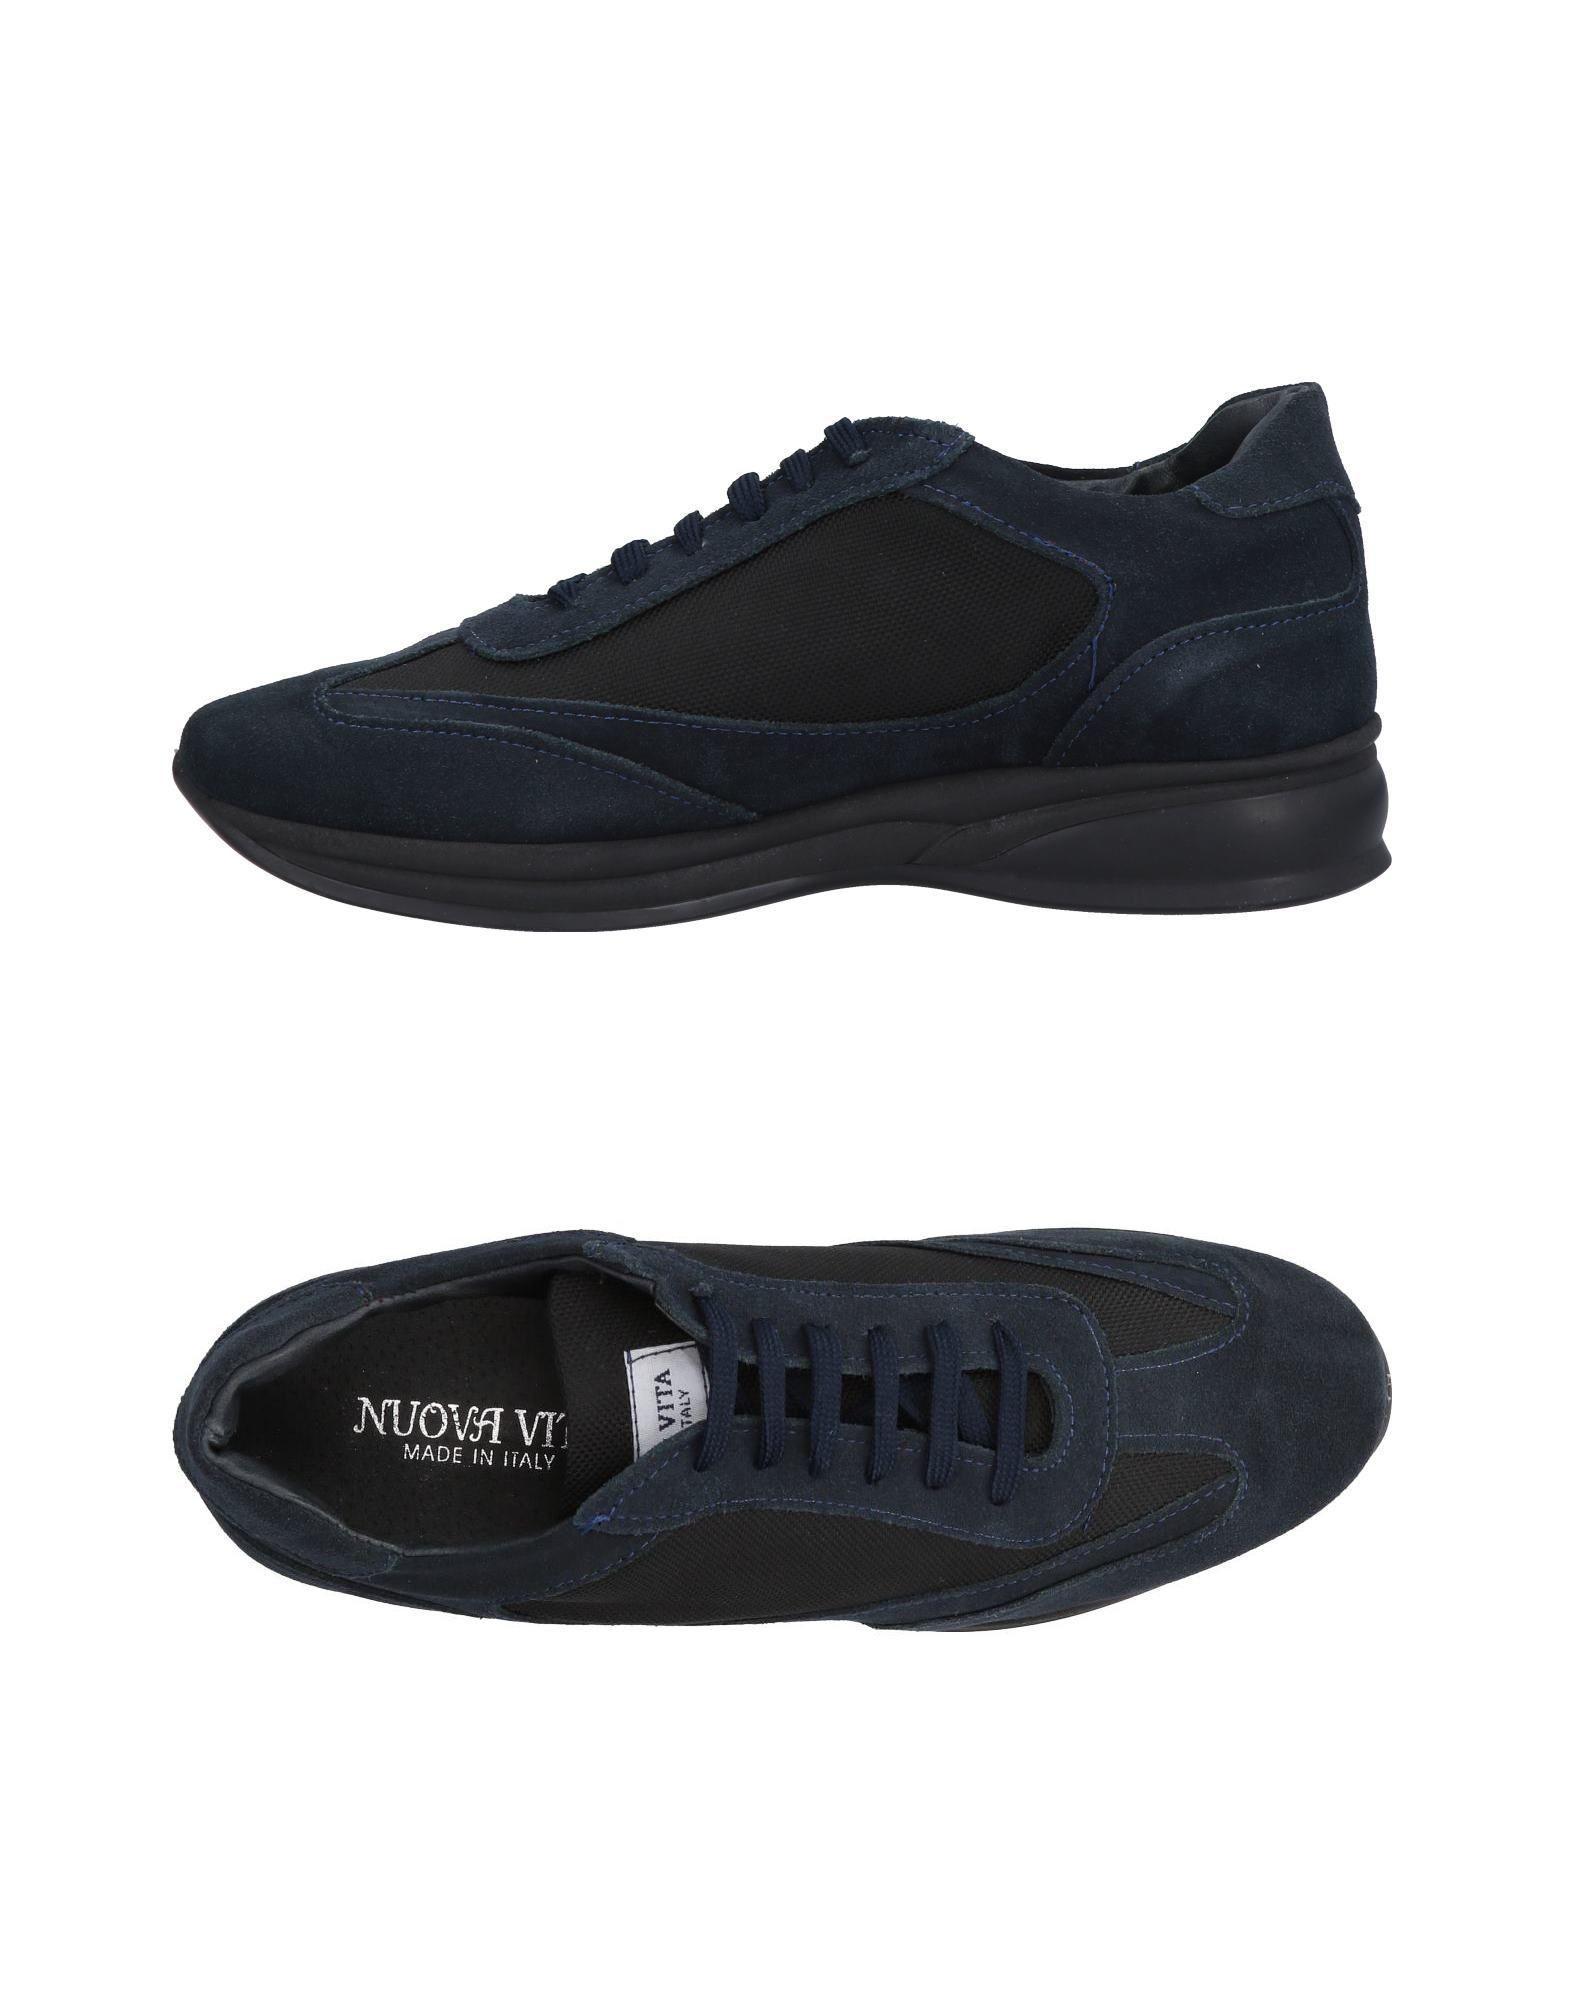 FOOTWEAR - Low-tops & sneakers Laboratorigarbo qZuPpU